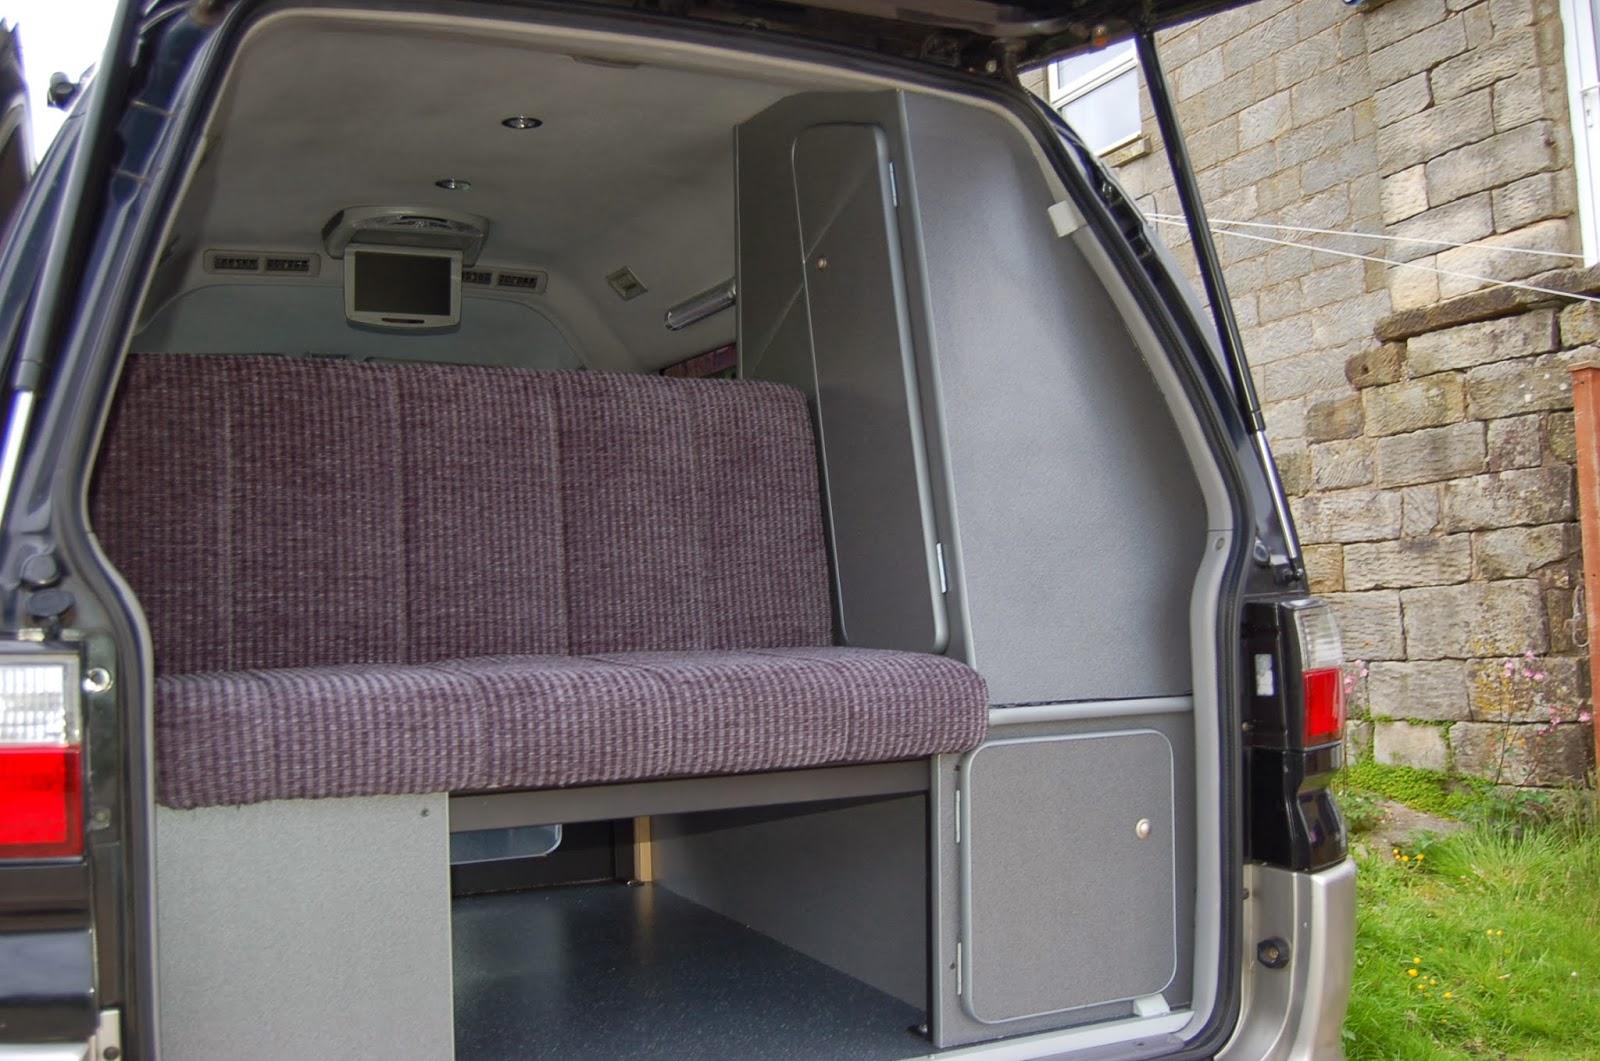 Hiace hobo living in a toyota camper van